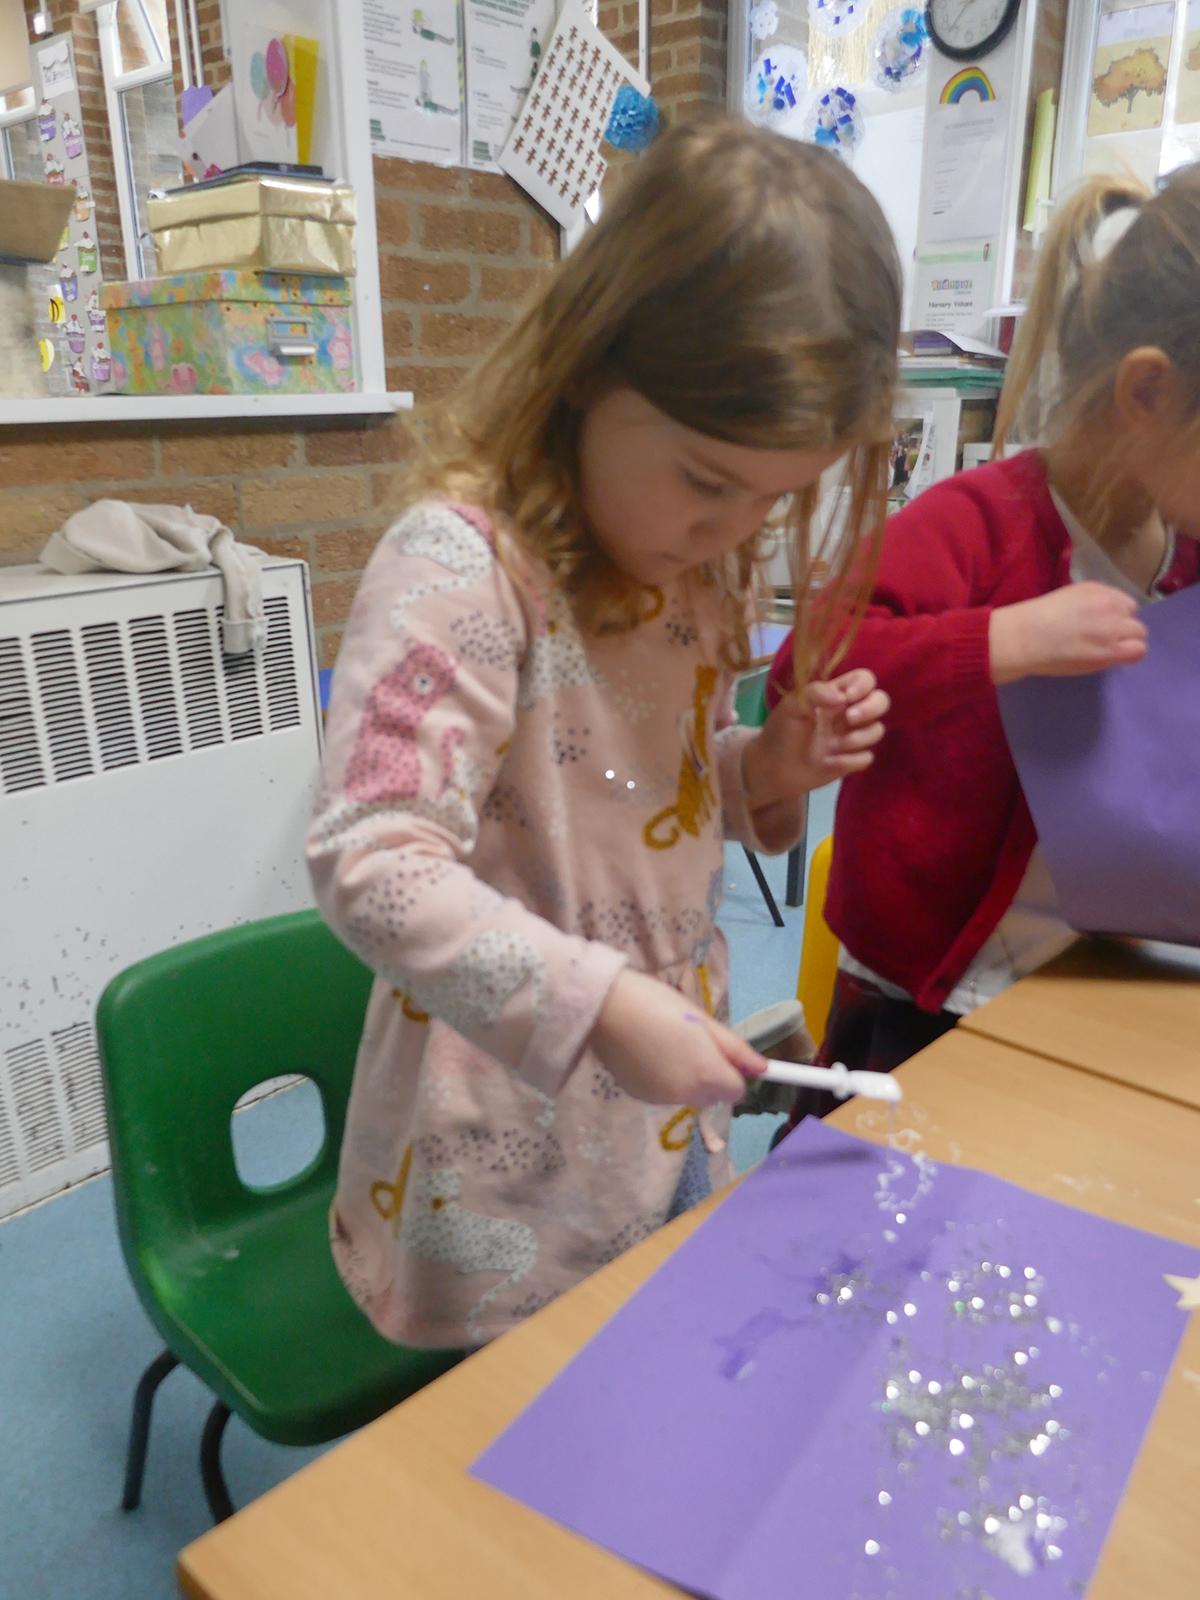 Little girl making a lantern